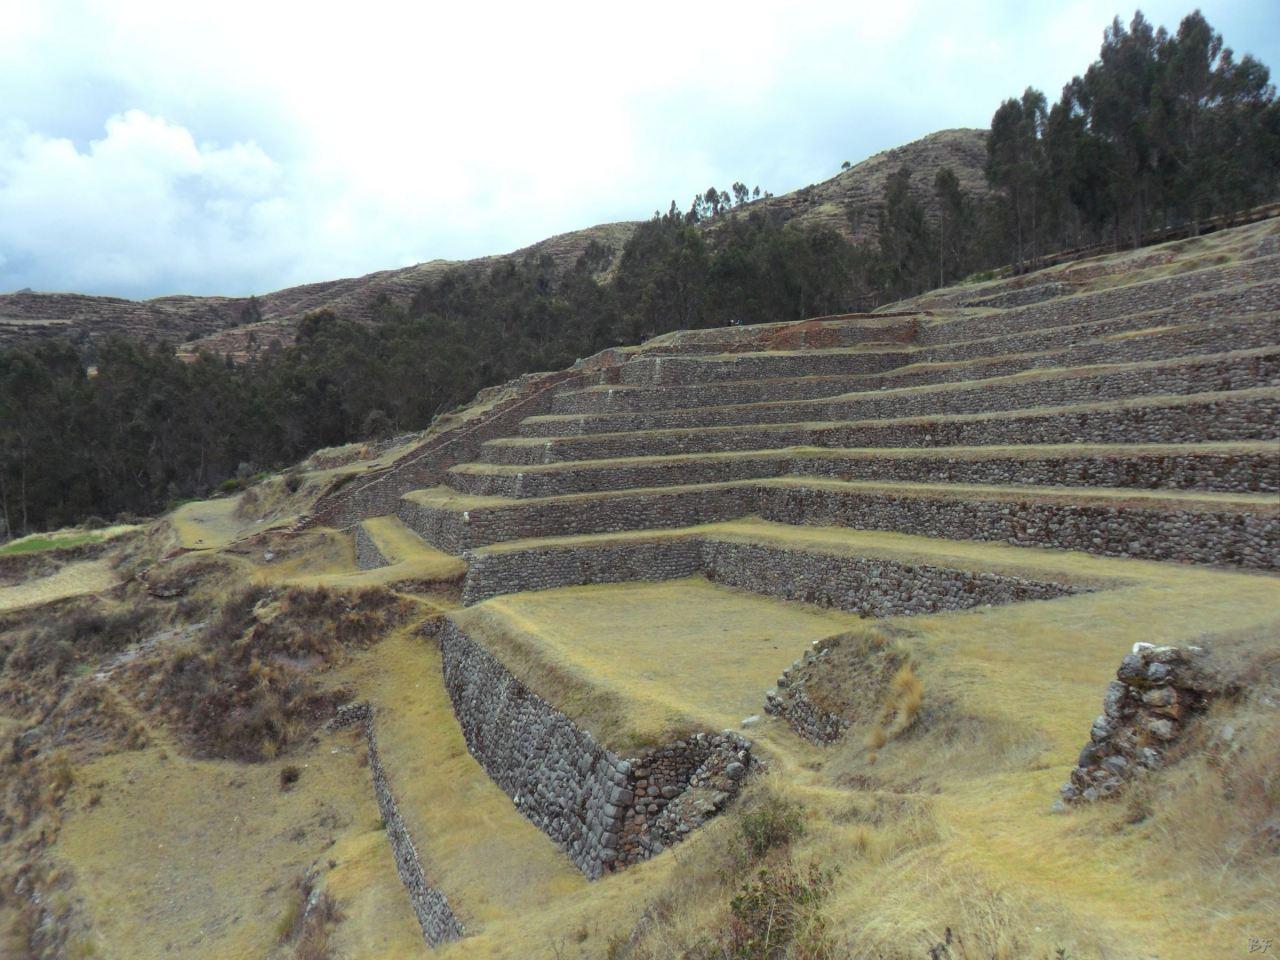 Chinchero-Mura-Poligonali-Piramide-Urubamba-Peru-77